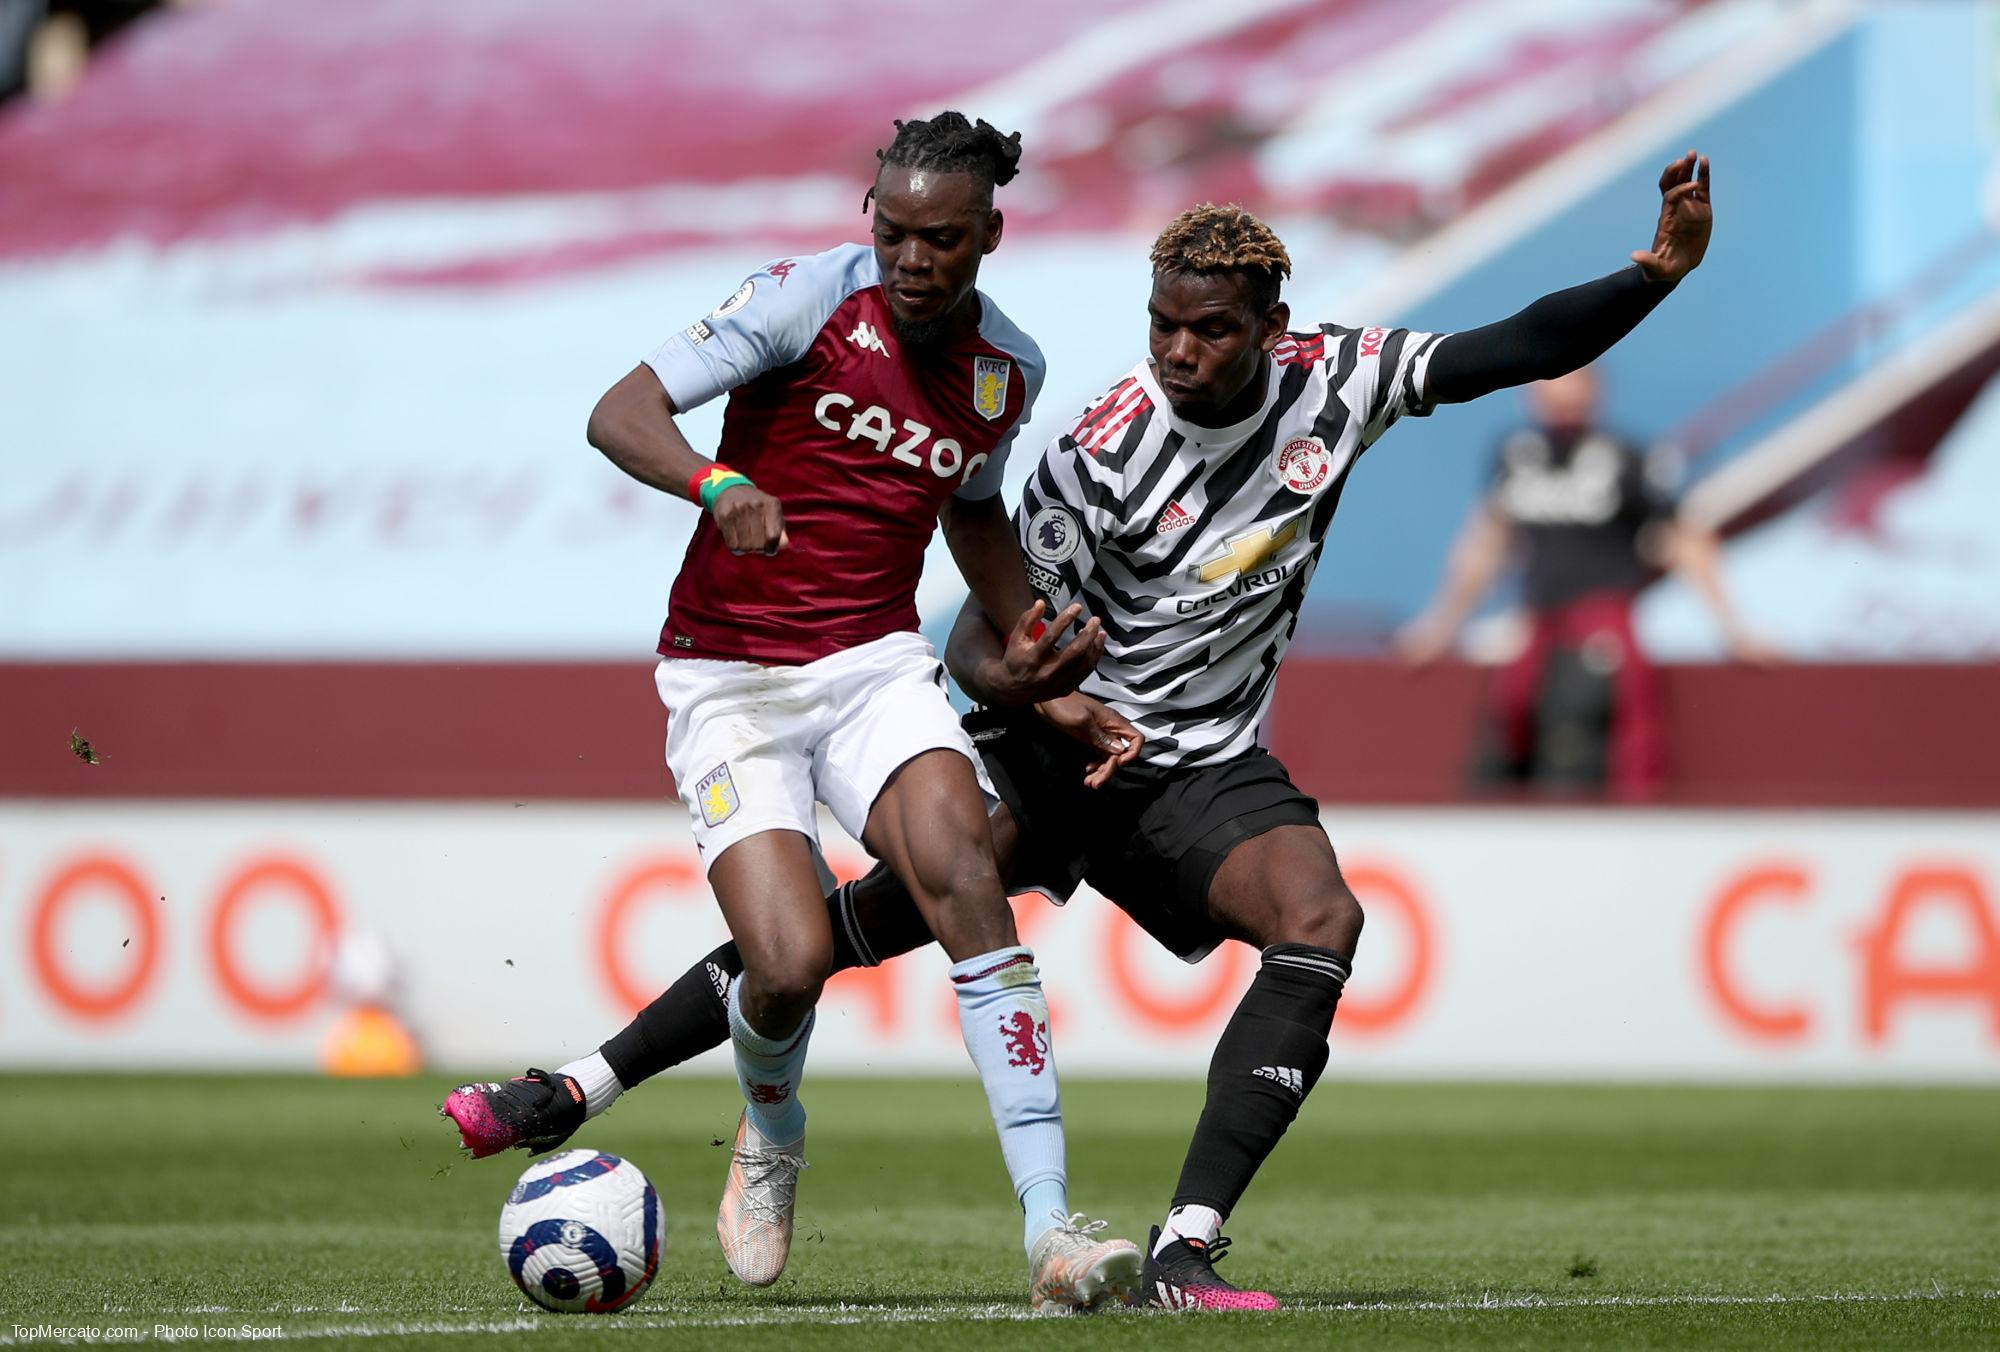 Bertrand Traoré et Paul Pogba, Aston Villa - Man. Utd